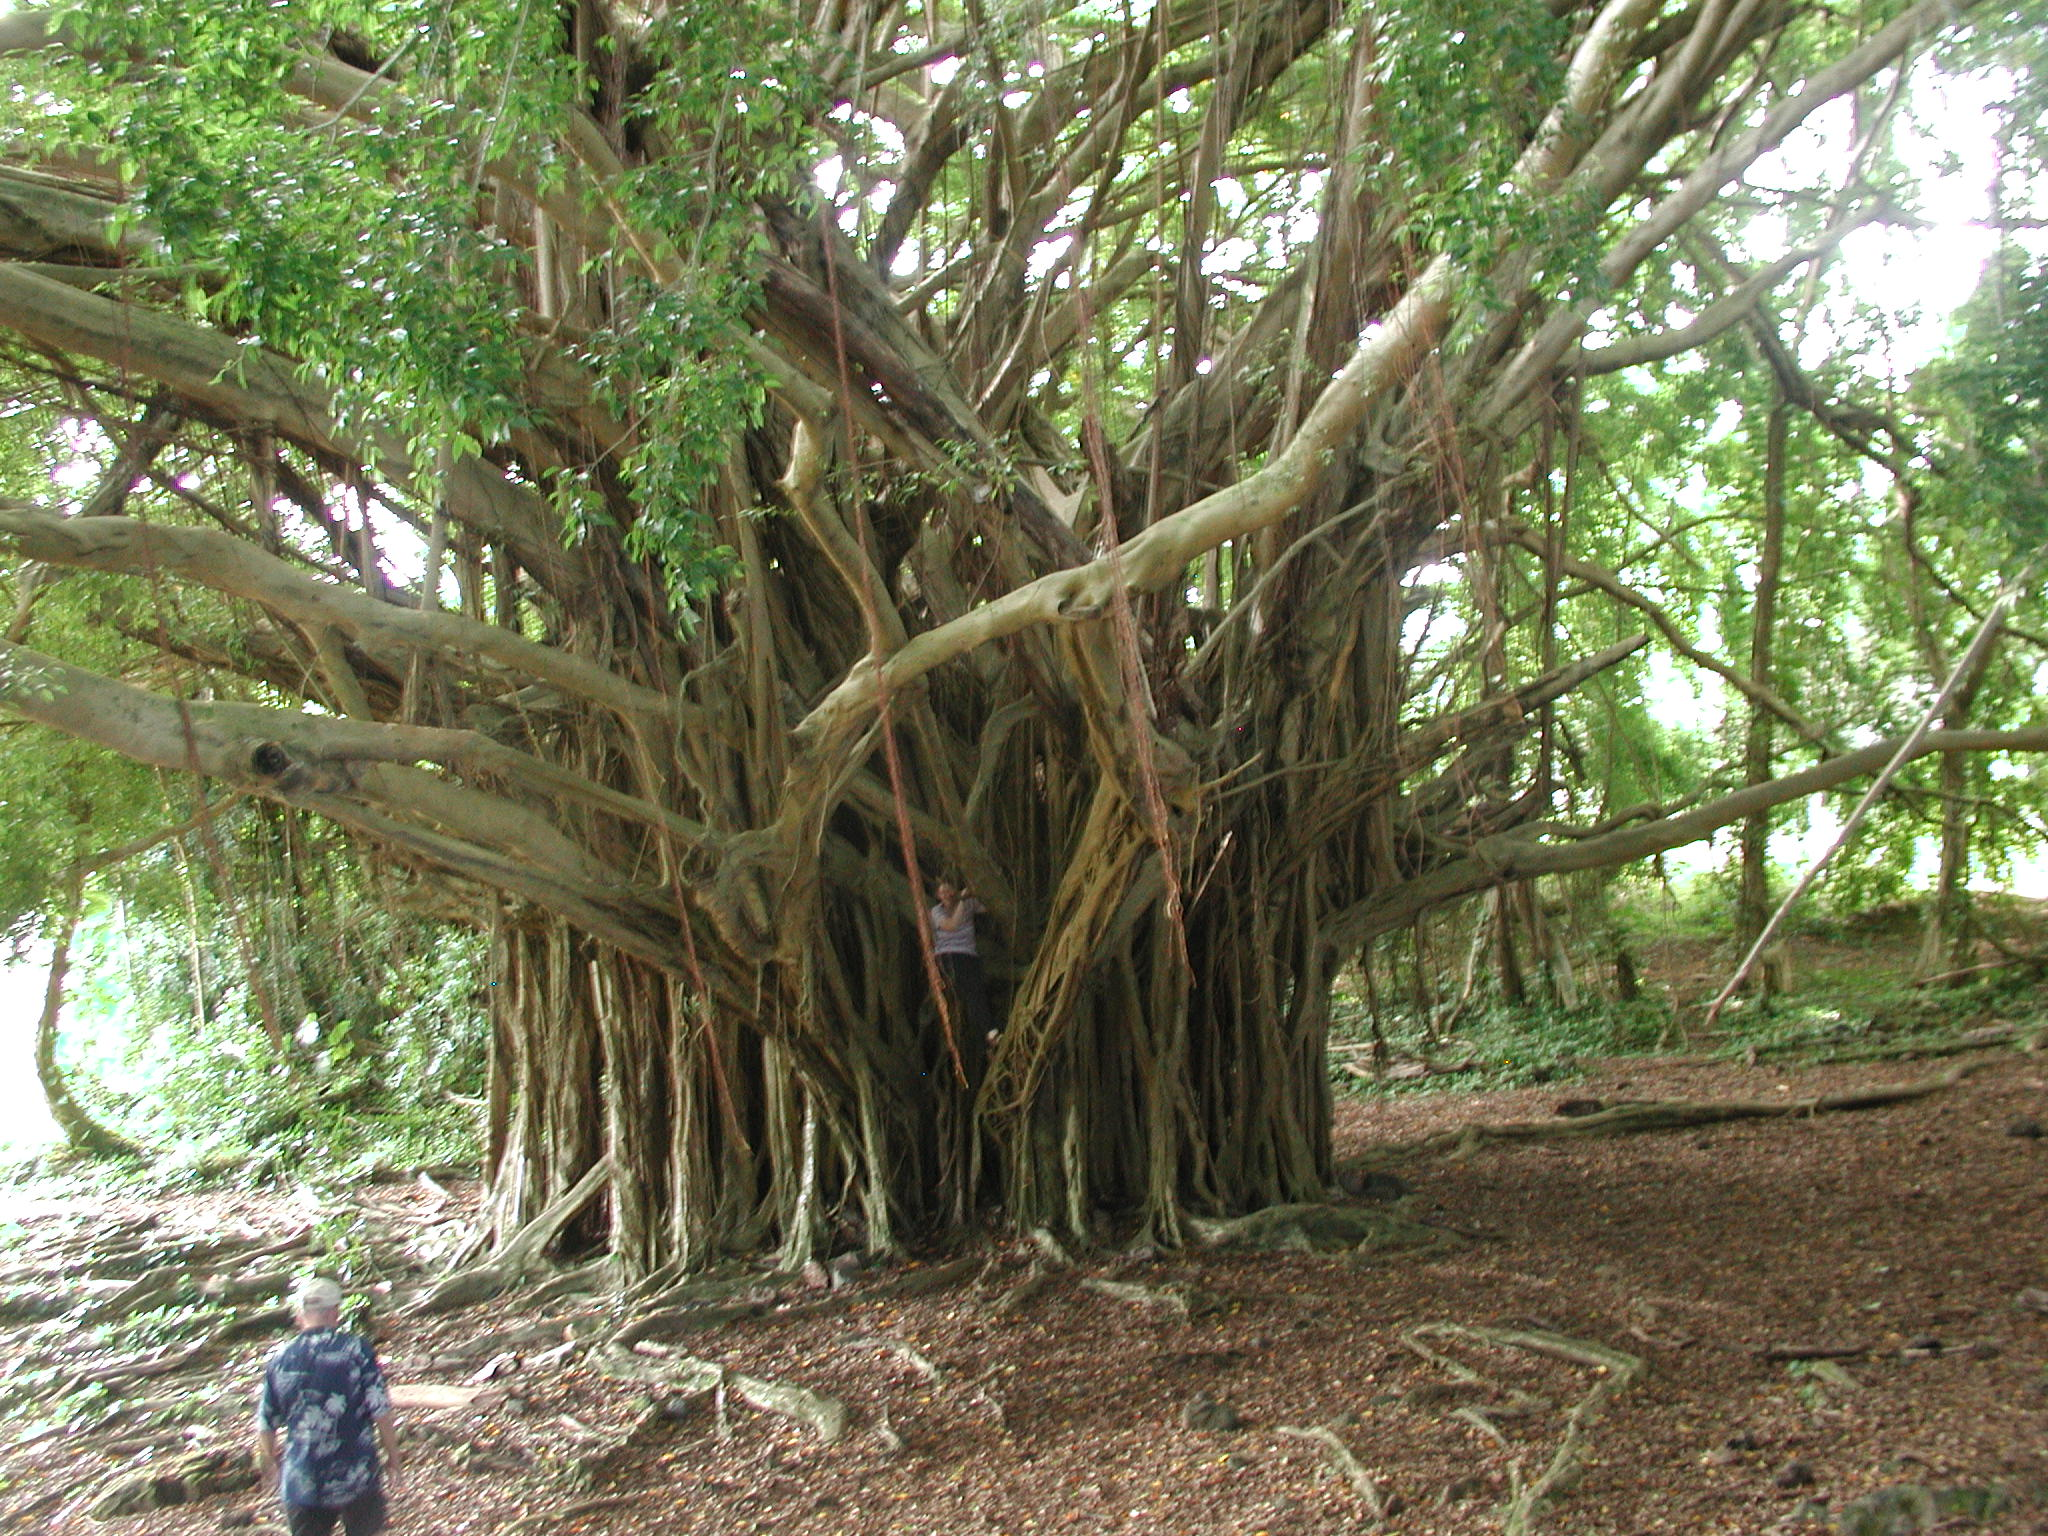 Banyan tree by kamiiyu on DeviantArt